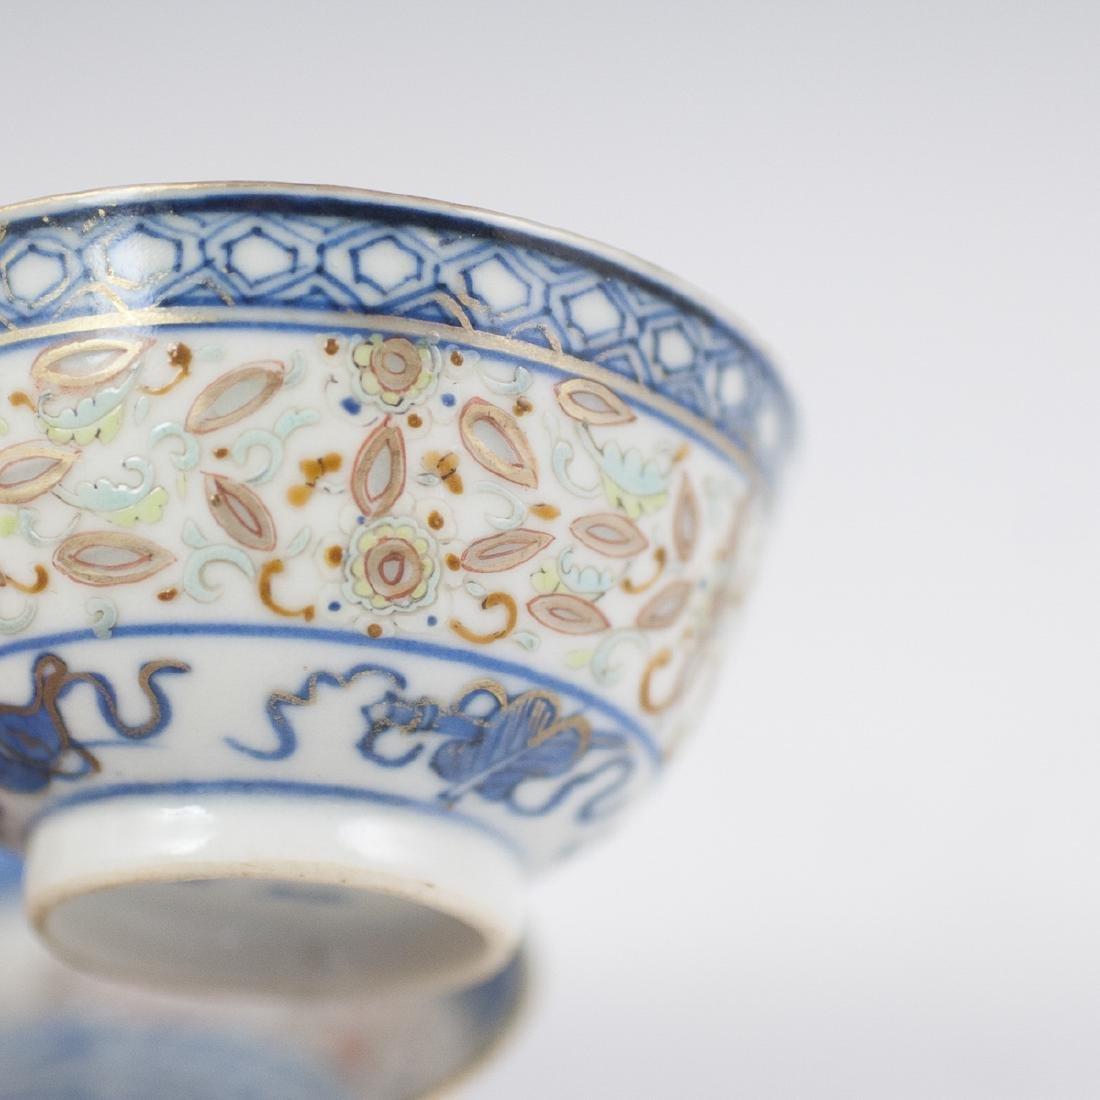 Chinese Porcelain De Riz Ware Demitasse Set - 2